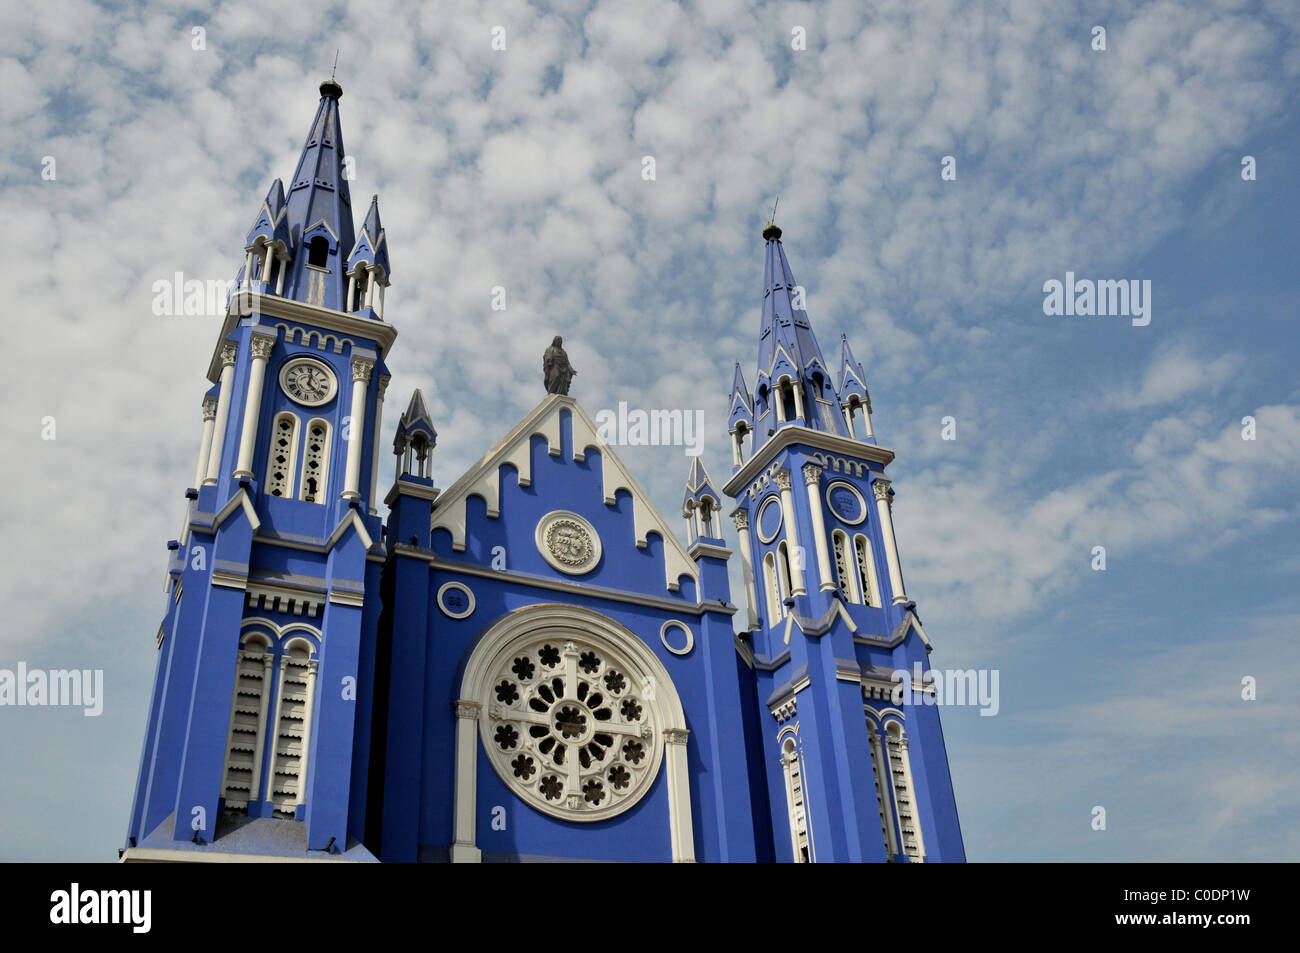 Chiesa blu, Parroquia de Los Sagrados, centro storico, Lima Peru Sud America Immagini Stock